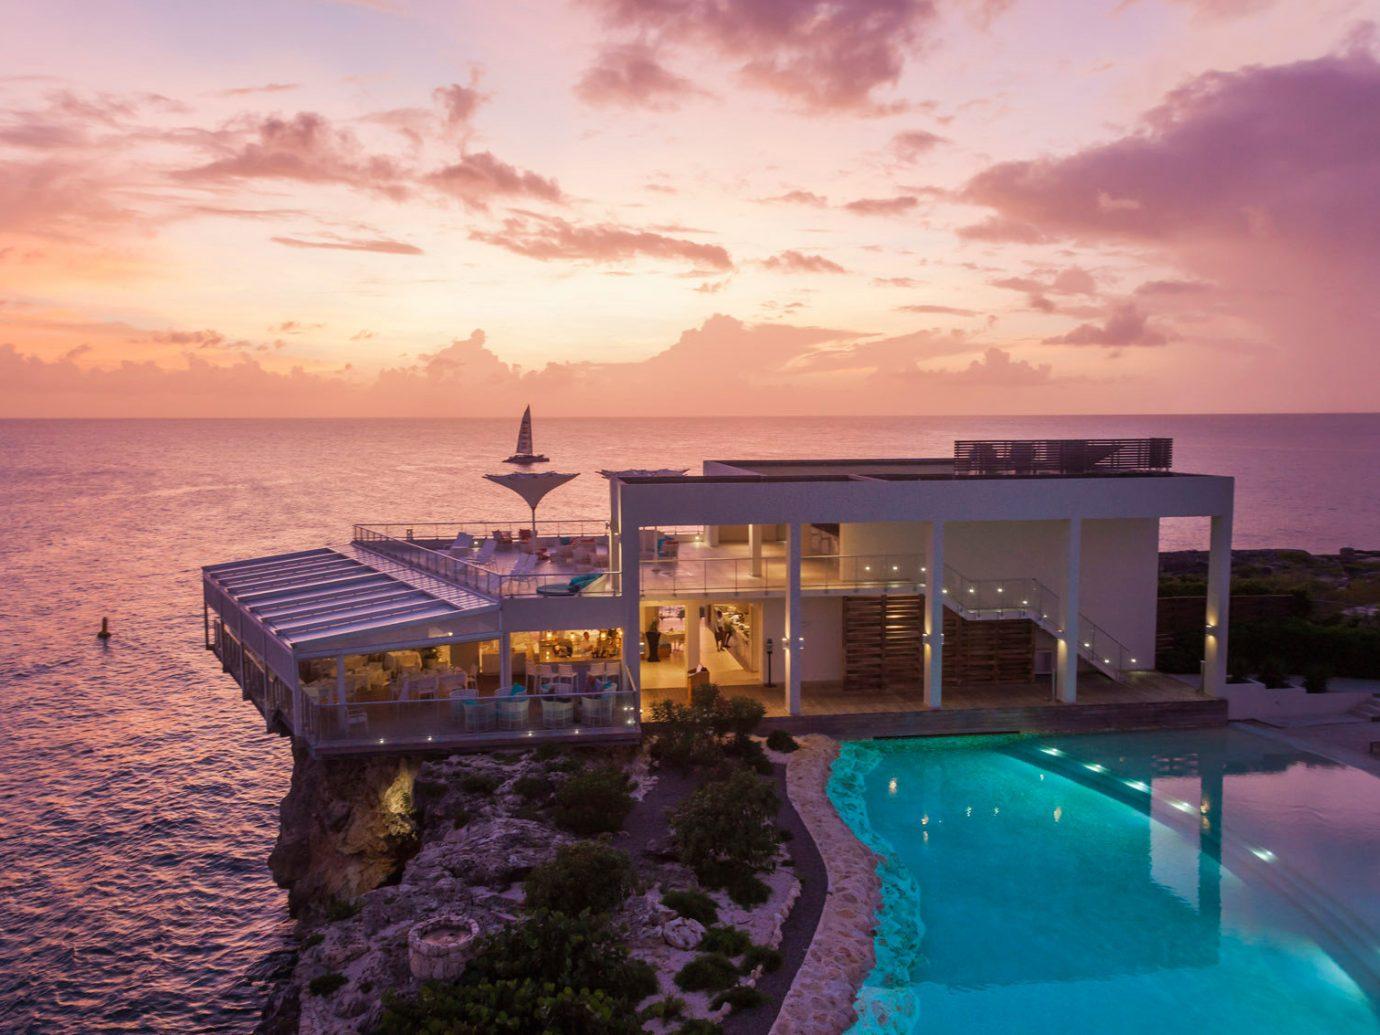 Hotels Trip Ideas sky outdoor water Sunset Sea Ocean vacation dusk Resort evening bay Coast estate clouds day